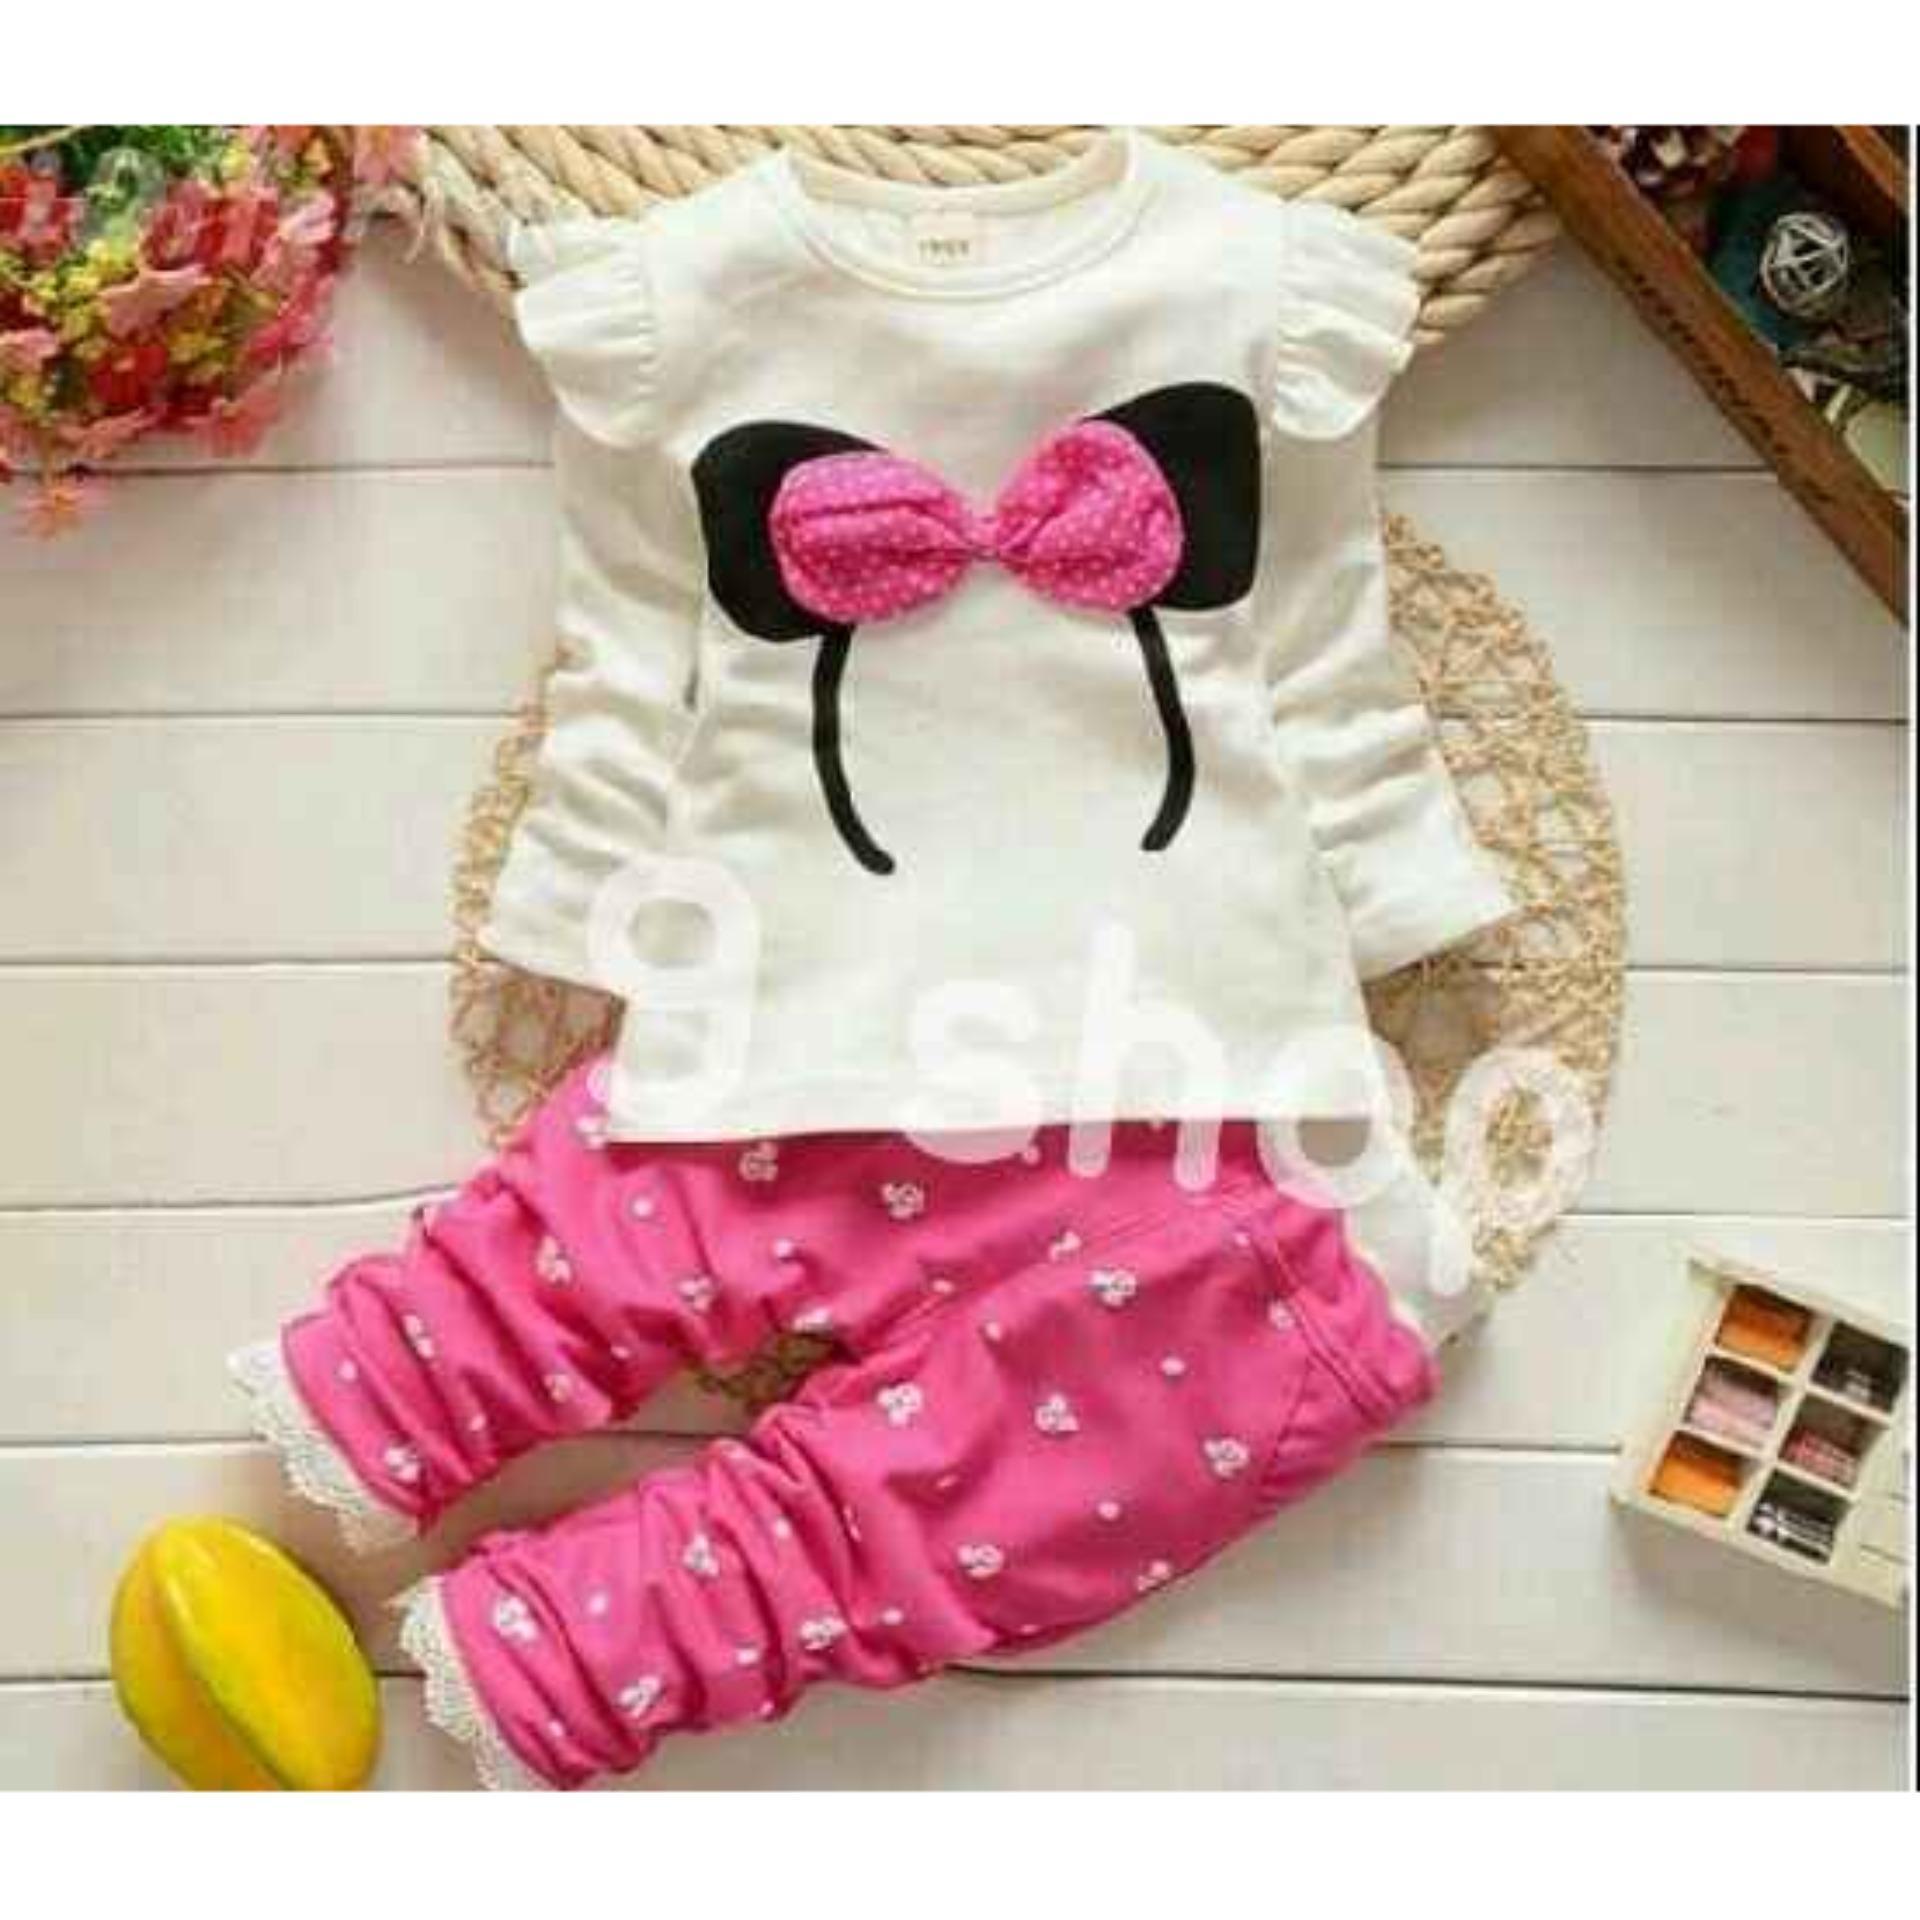 9 Shop Setelan Baju dan Celana Anak Perempuan BANDO / Stelan Baju Anak Perempuan / Stelan Anak Cewek / Baju Anak Perempuan / Celana Anak Perempuan / Setelan Anak Cewek / Setelan Anak Murah / Baju Anak Murah / Stelan Kartun Anak